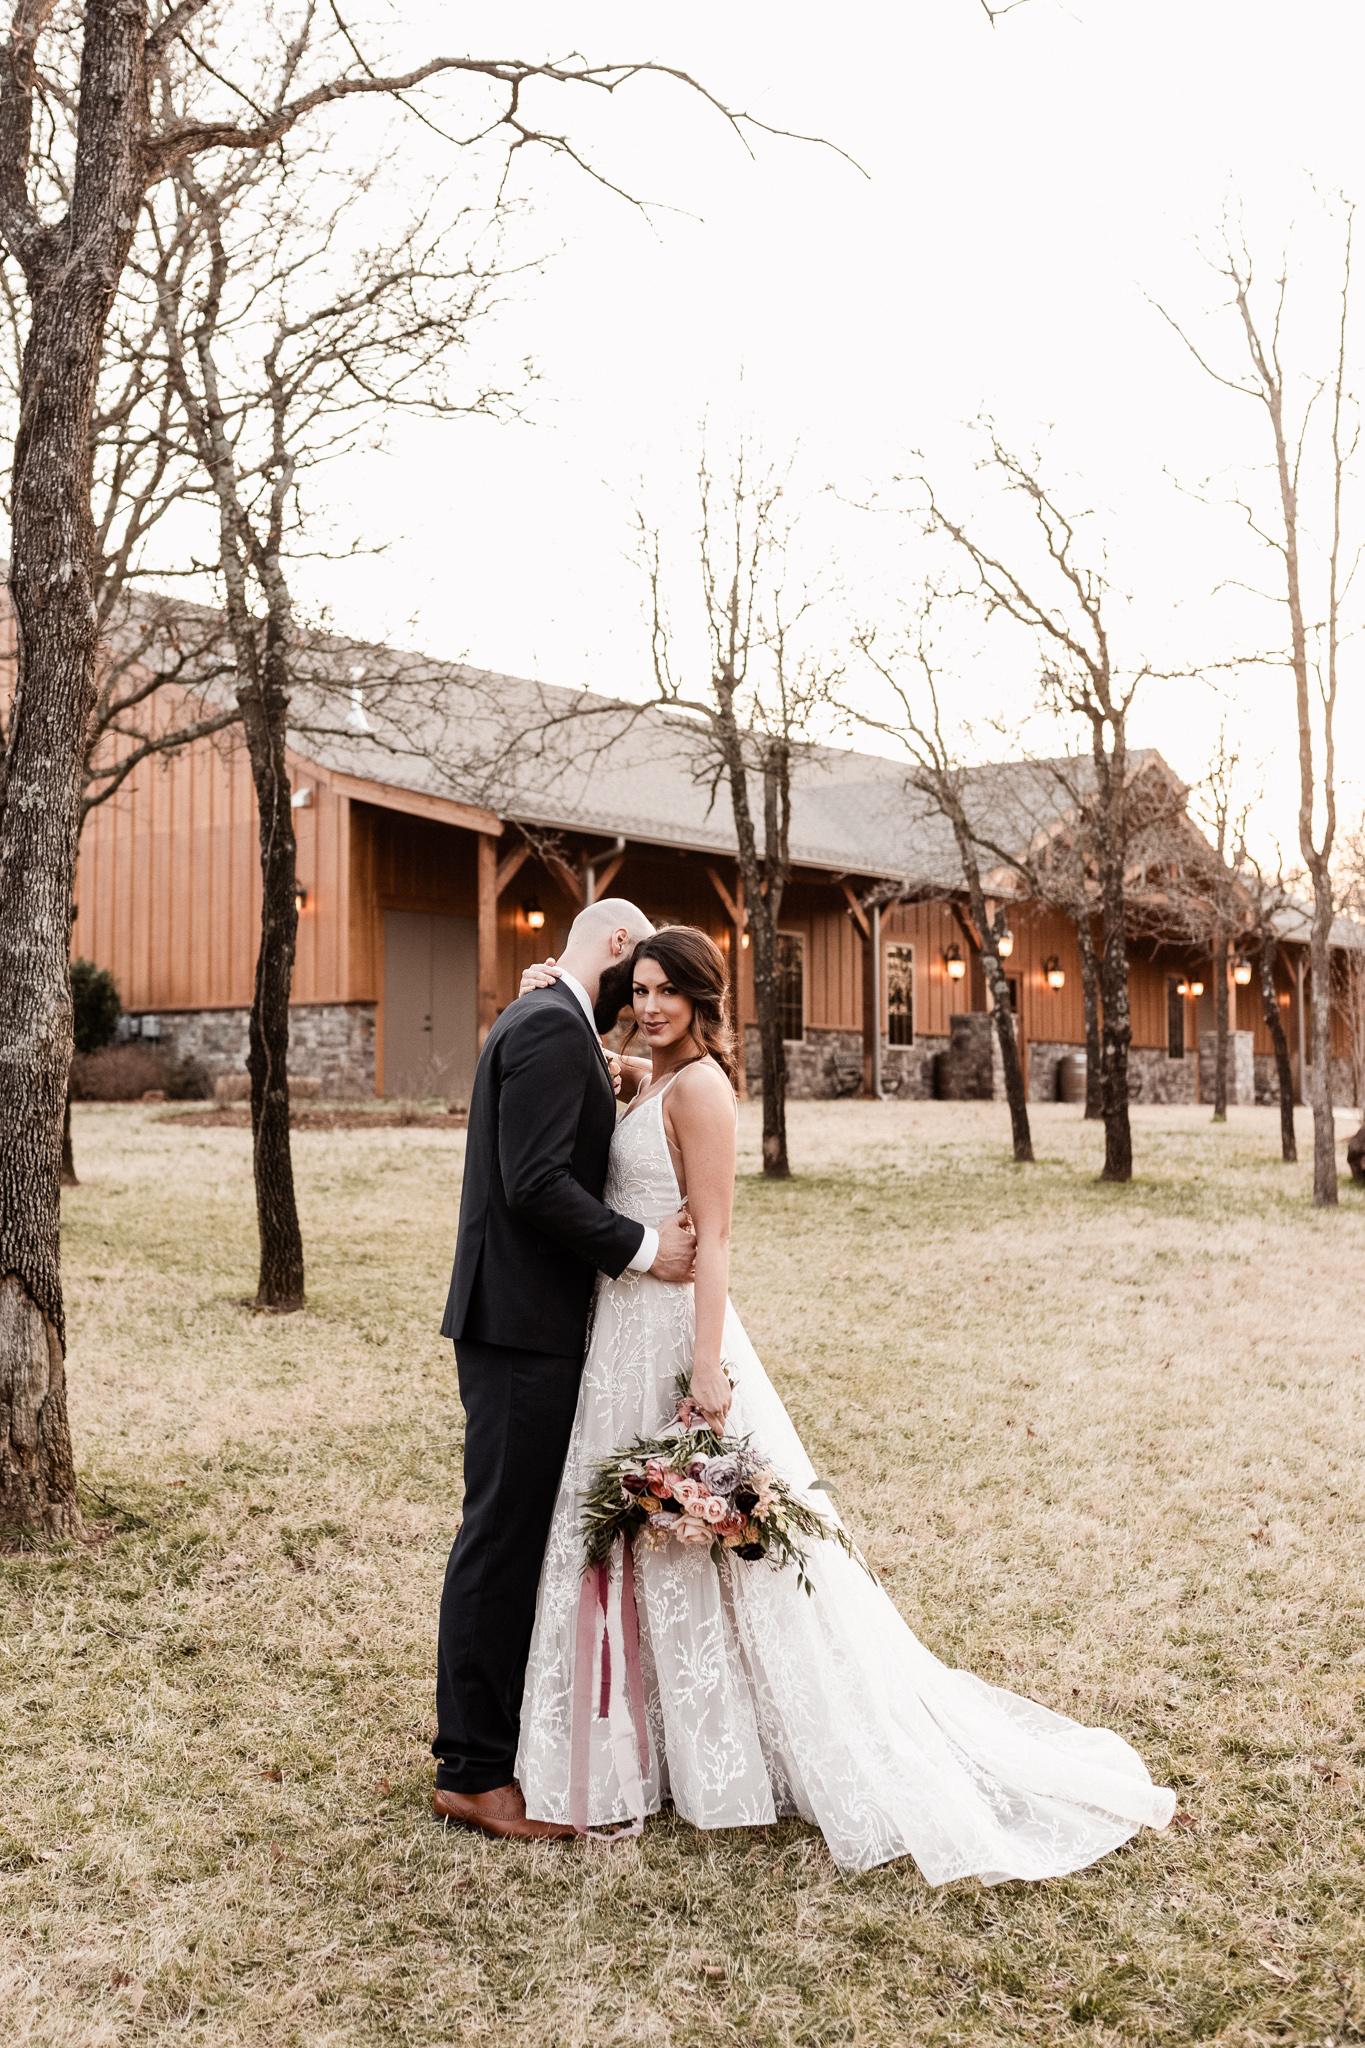 Cultivate Event Planning Styled Shoot   Colorful Romantic Barn Wedding Inspo   Oklahoma Wedding Photographer-132.jpg